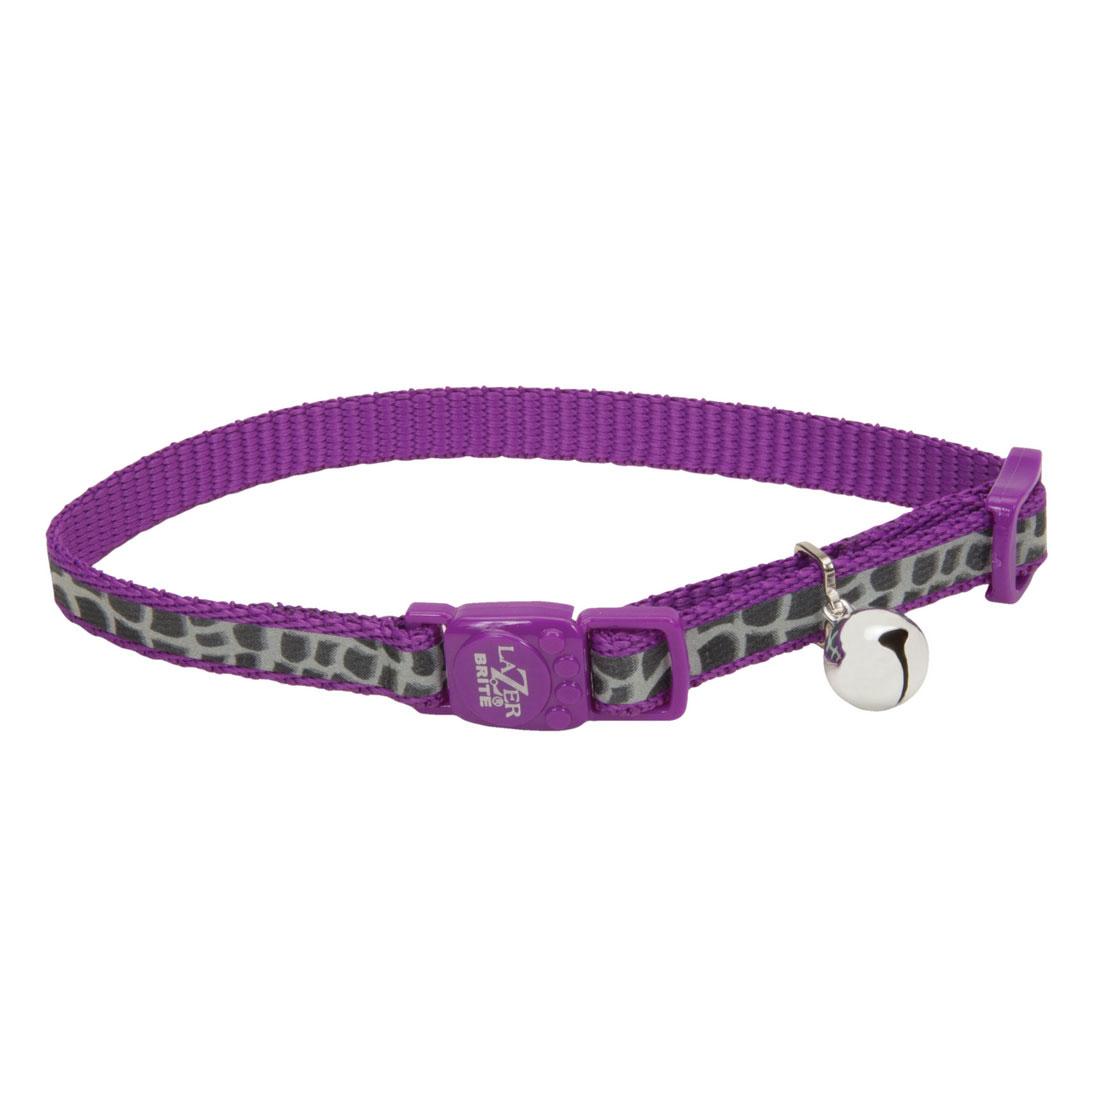 Coastal Pet Lazer Brite Reflective Adjustable Breakaway Cat Collar, Purple Animal Print, 3/8-in